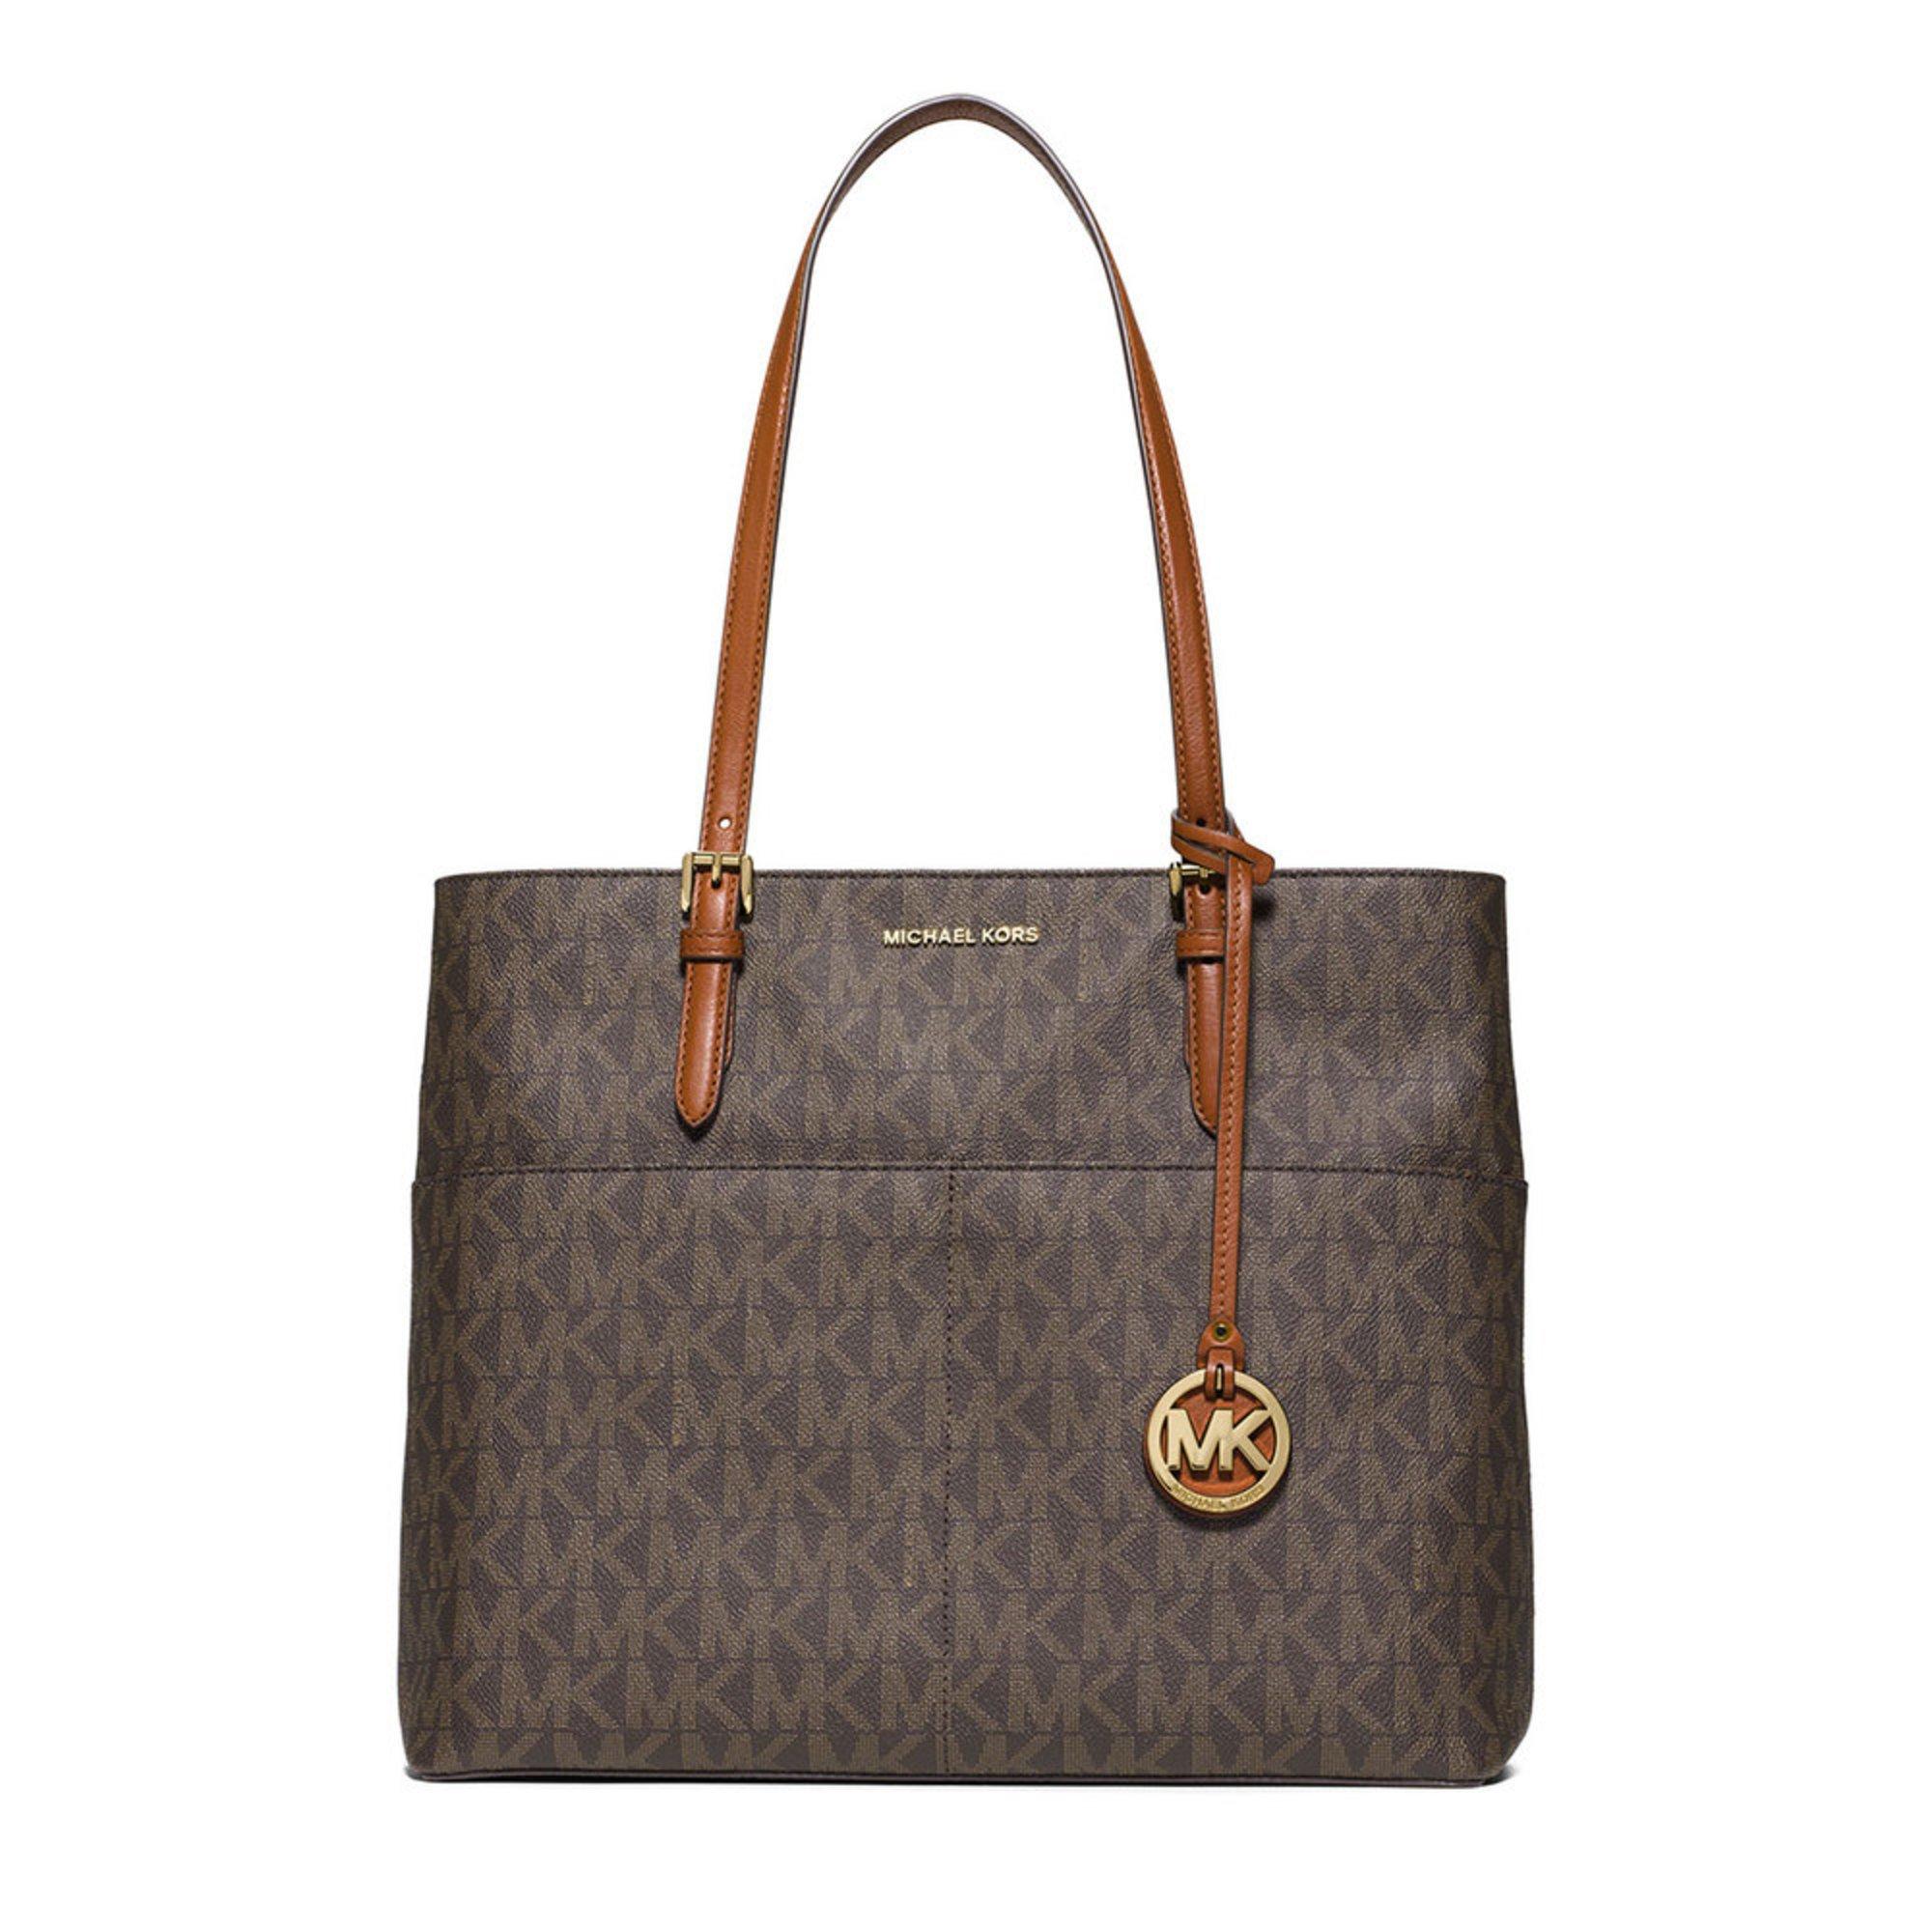 michael kors bedford large pocket tote brown handbags accessories shop your navy exchange. Black Bedroom Furniture Sets. Home Design Ideas